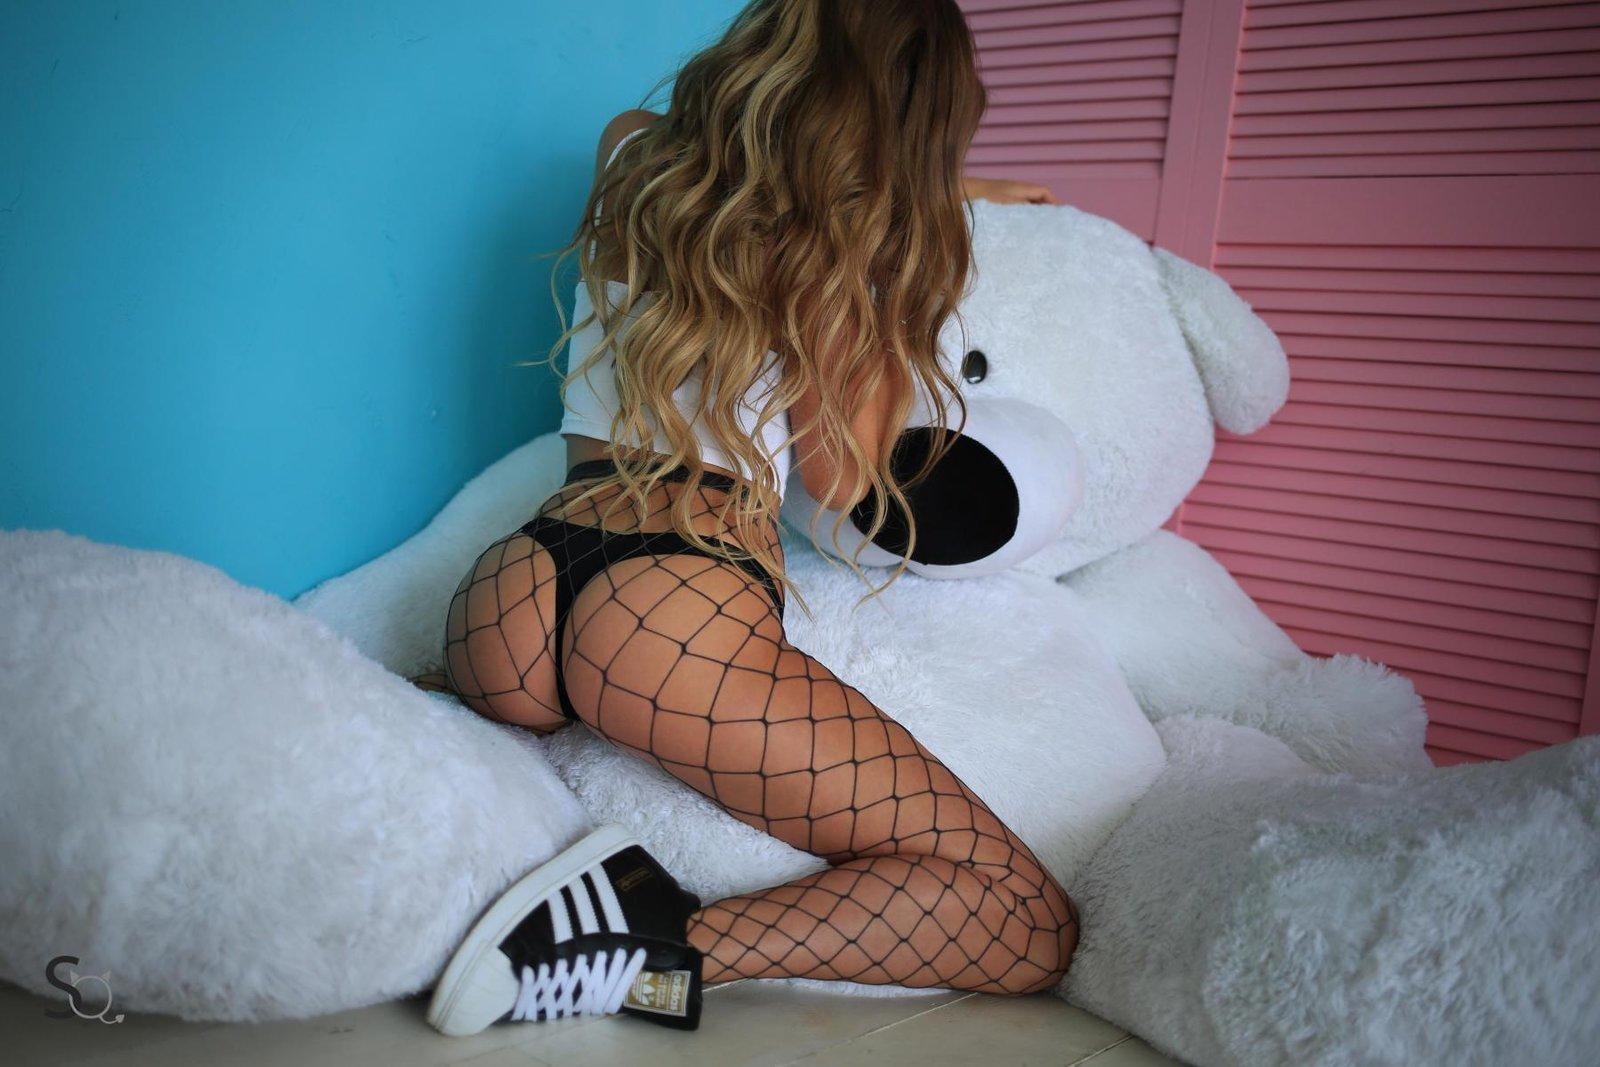 czarne filmy sex grupowe Vanessa del Rio lesbijskie porno